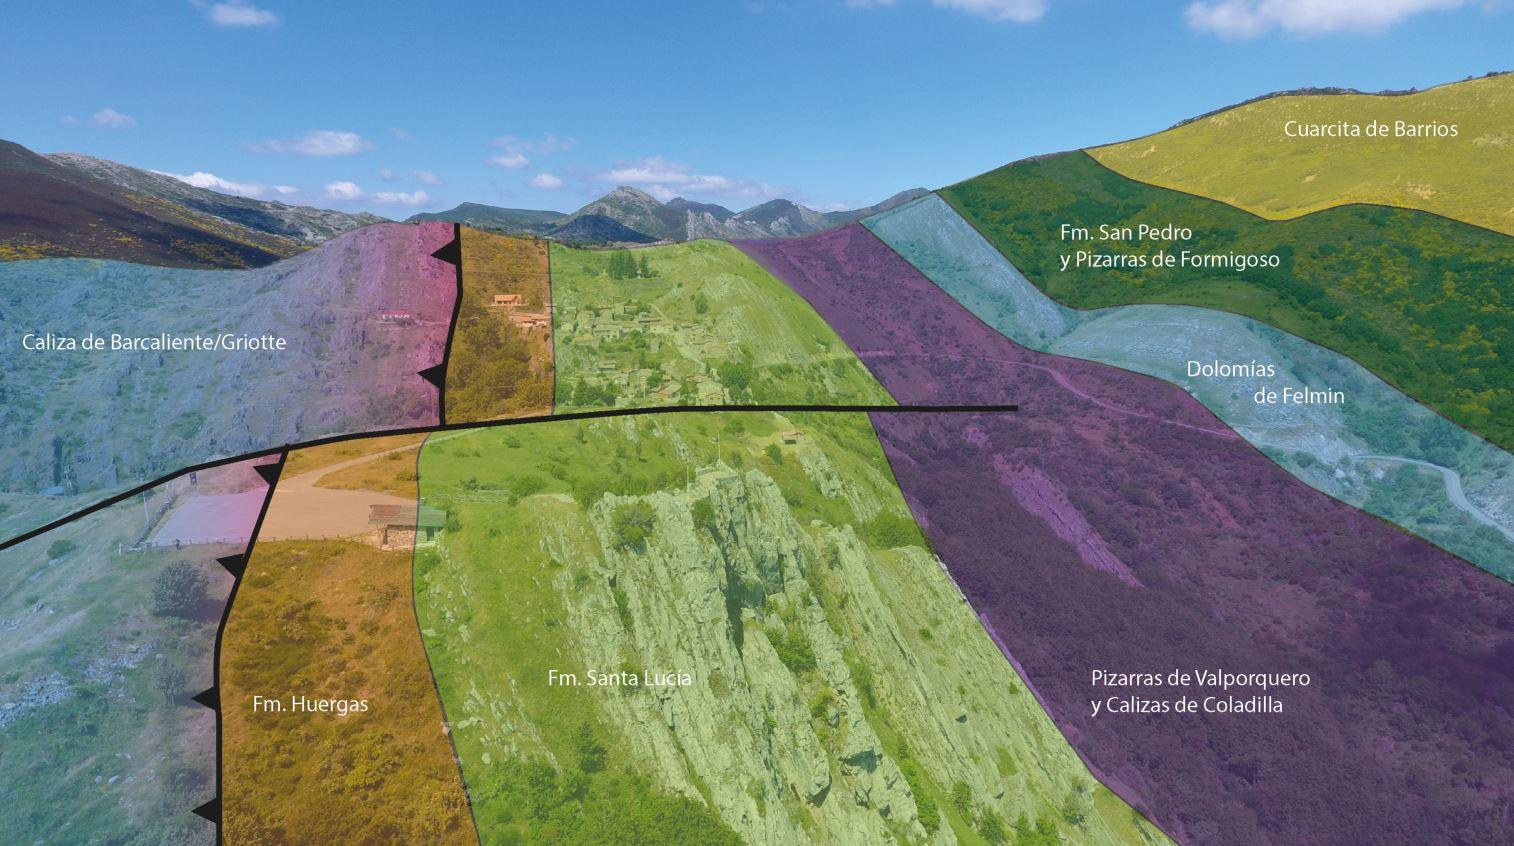 Geolod a le n 17 valporquero la magia del agua sobre la roca for Formacion de la roca